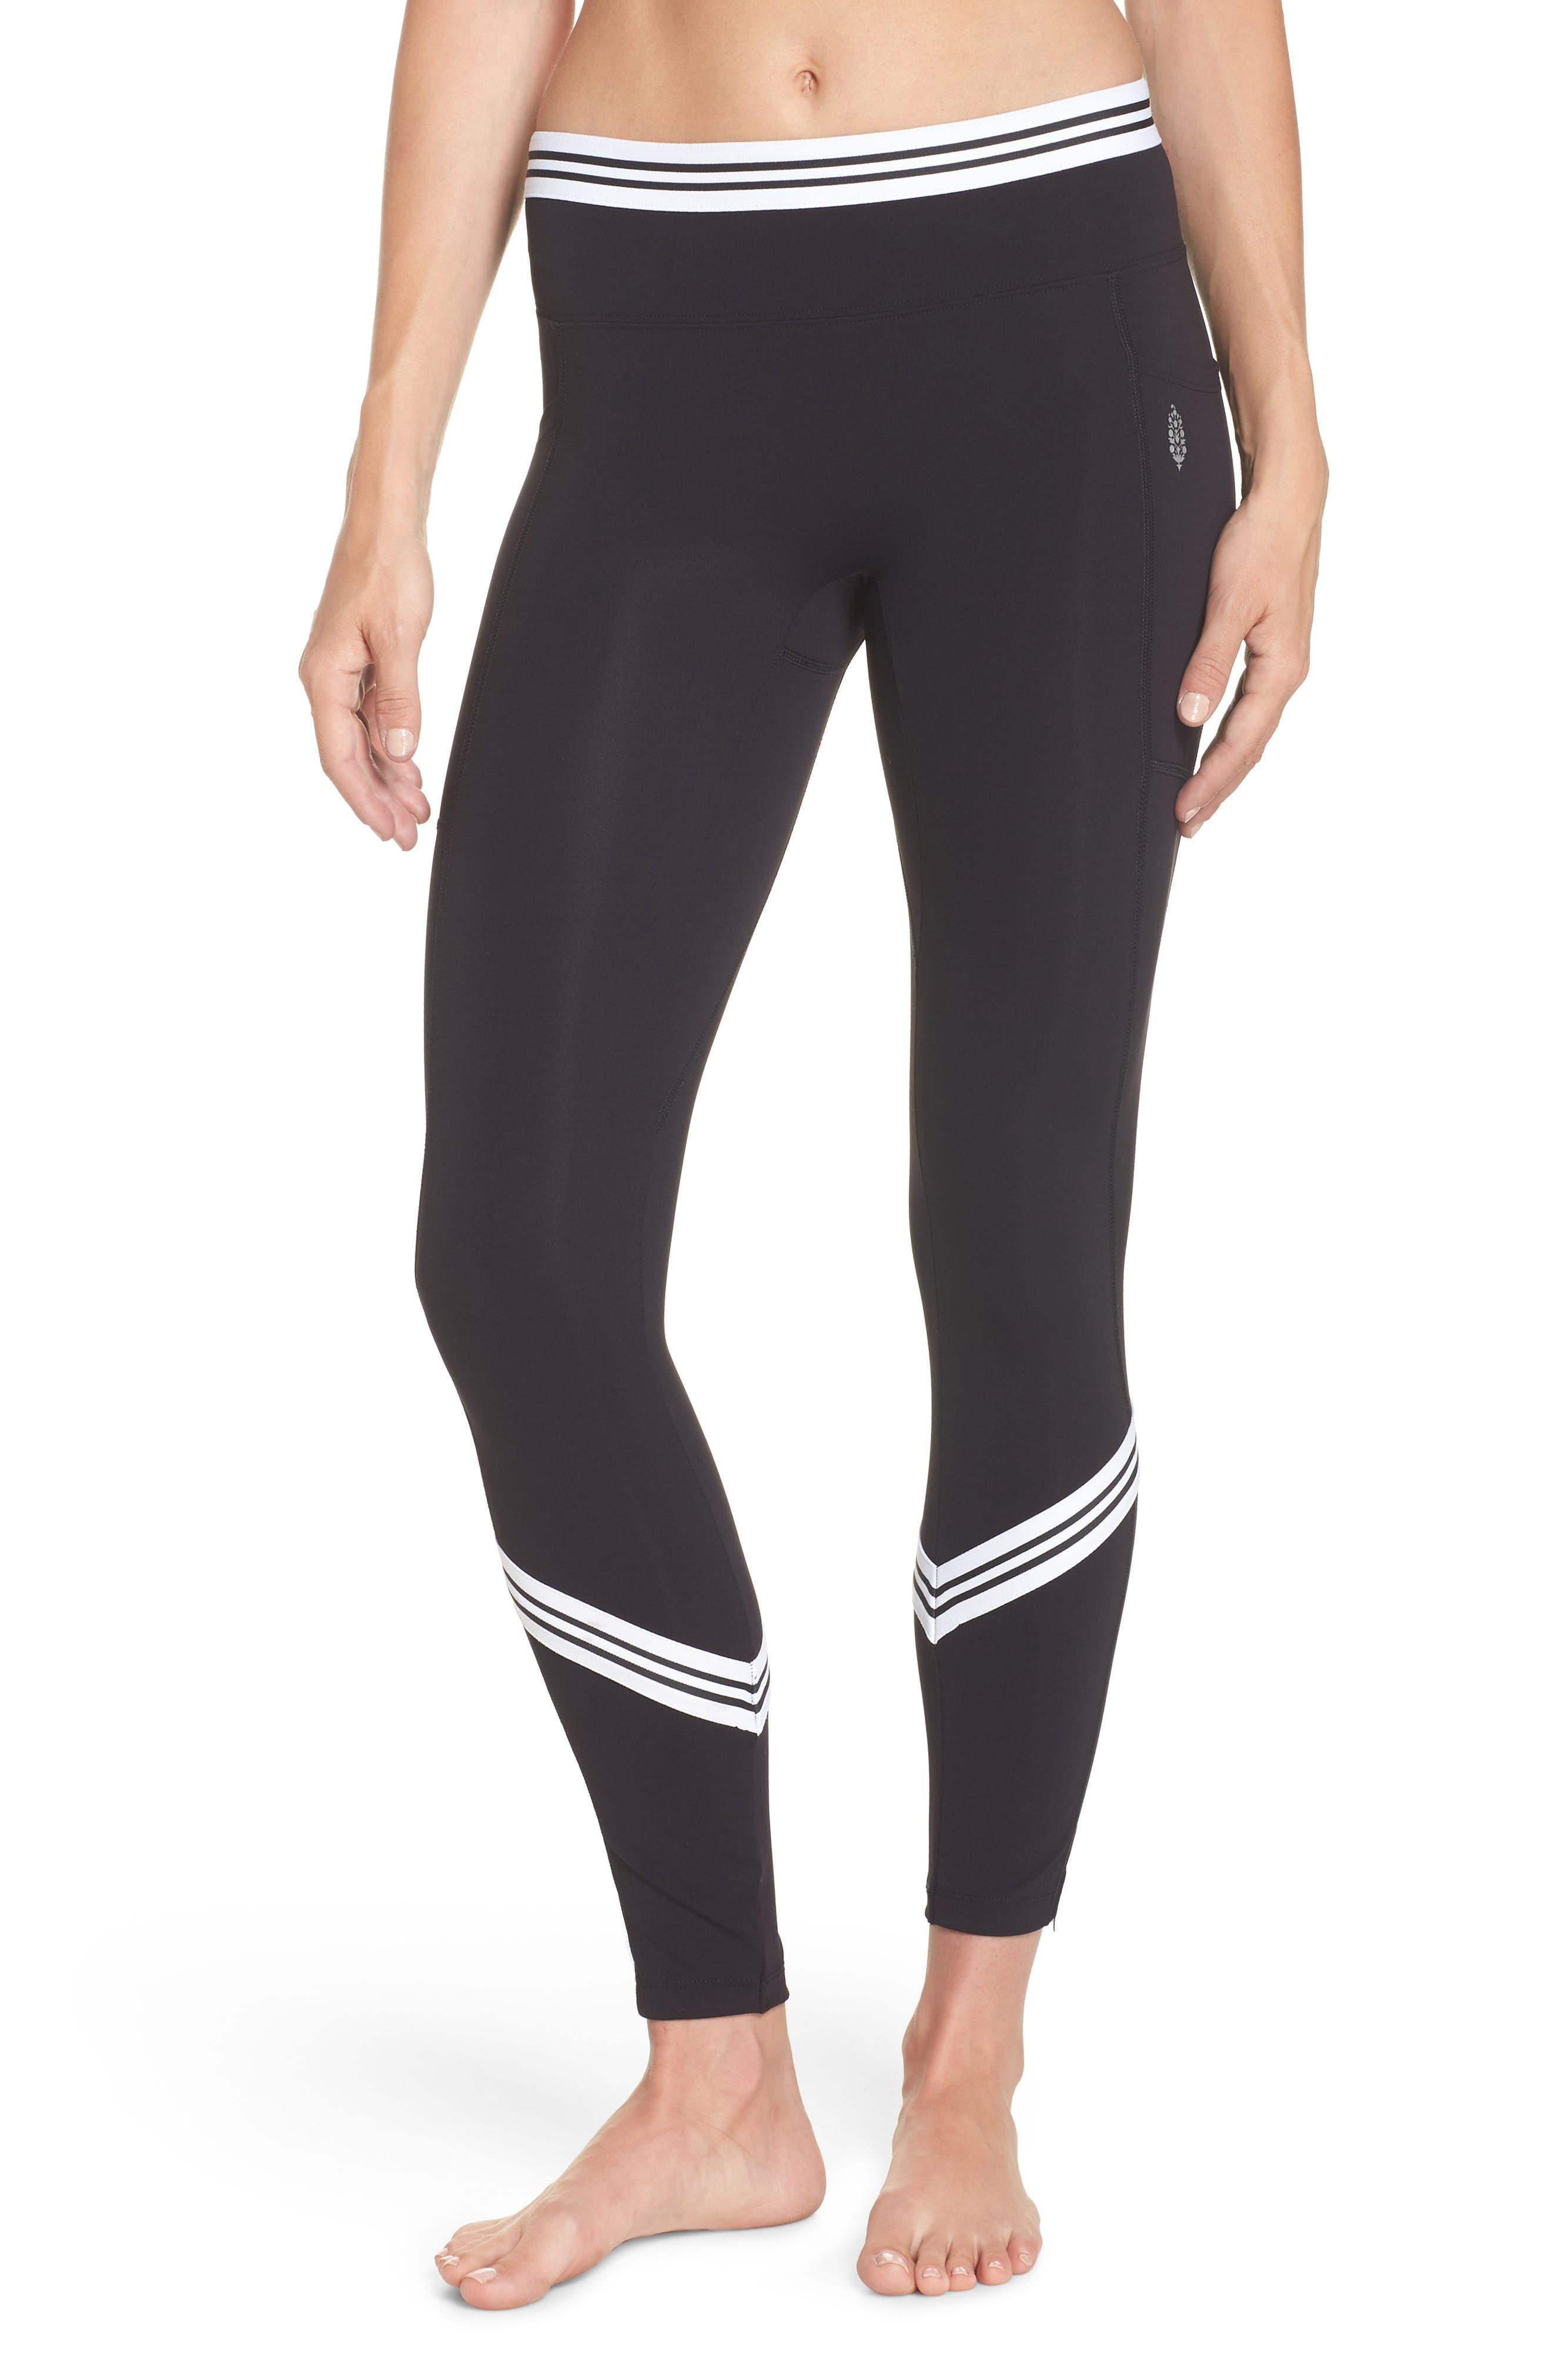 FP Movement Zephyr Leggings,                         Main,                         color, Black